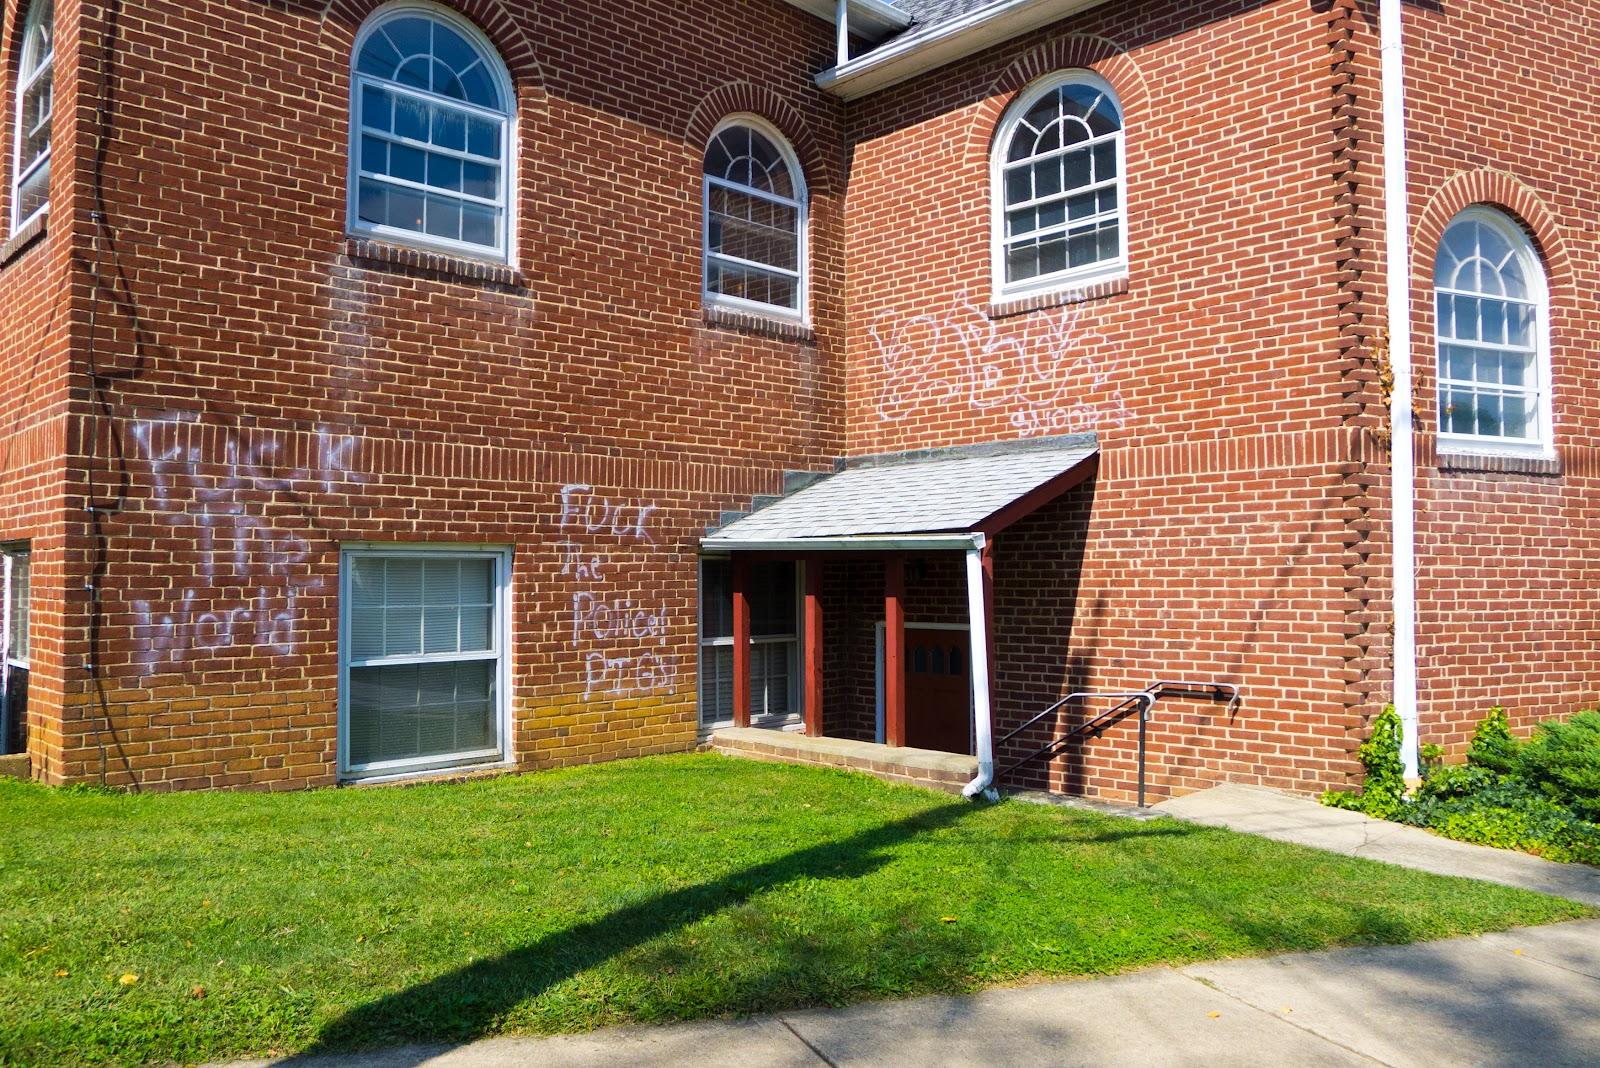 Community fellowship church brookland terrace